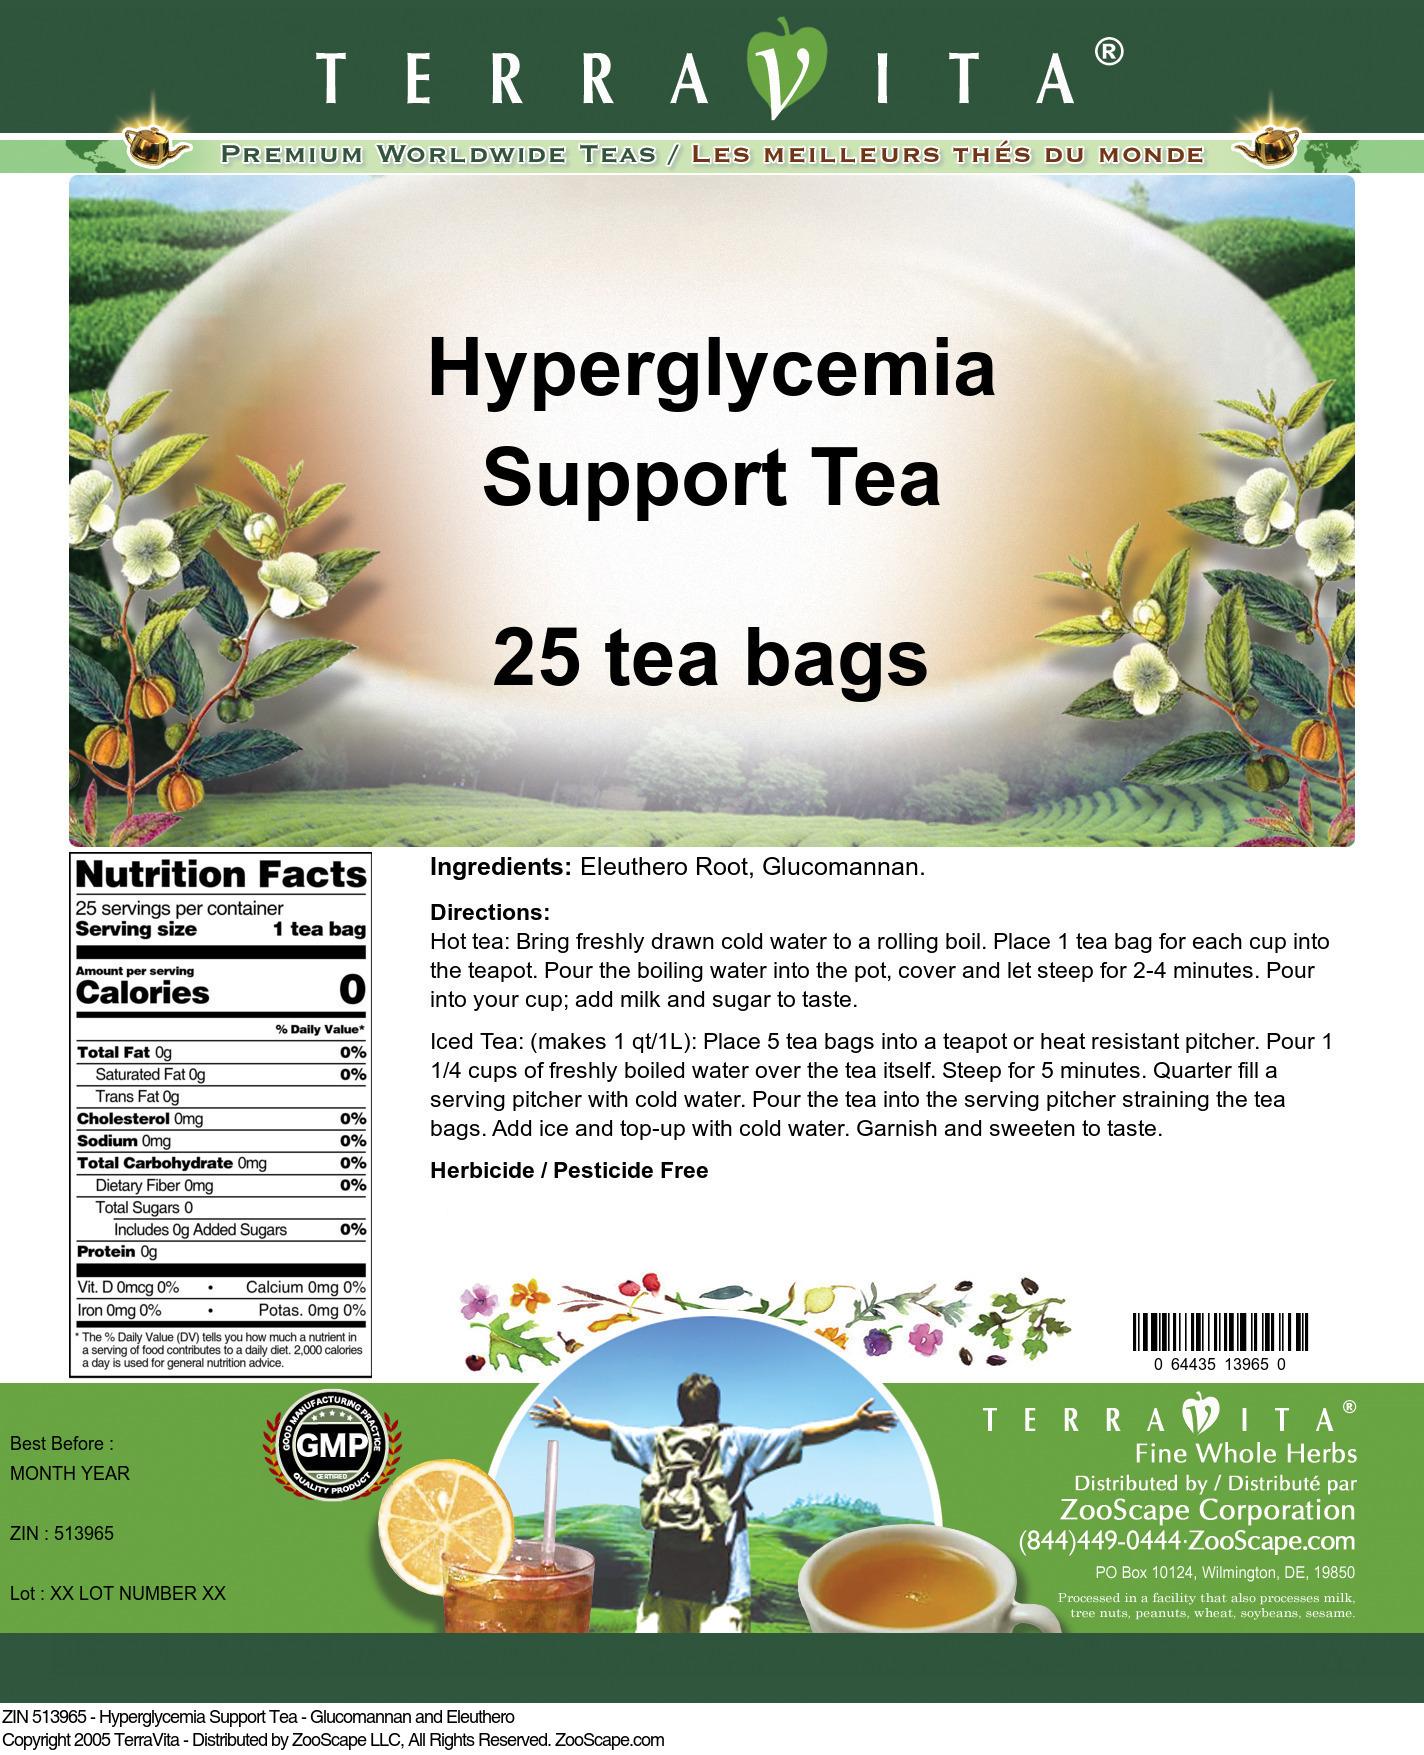 Hyperglycemia Support Tea - Glucomannan and Eleuthero